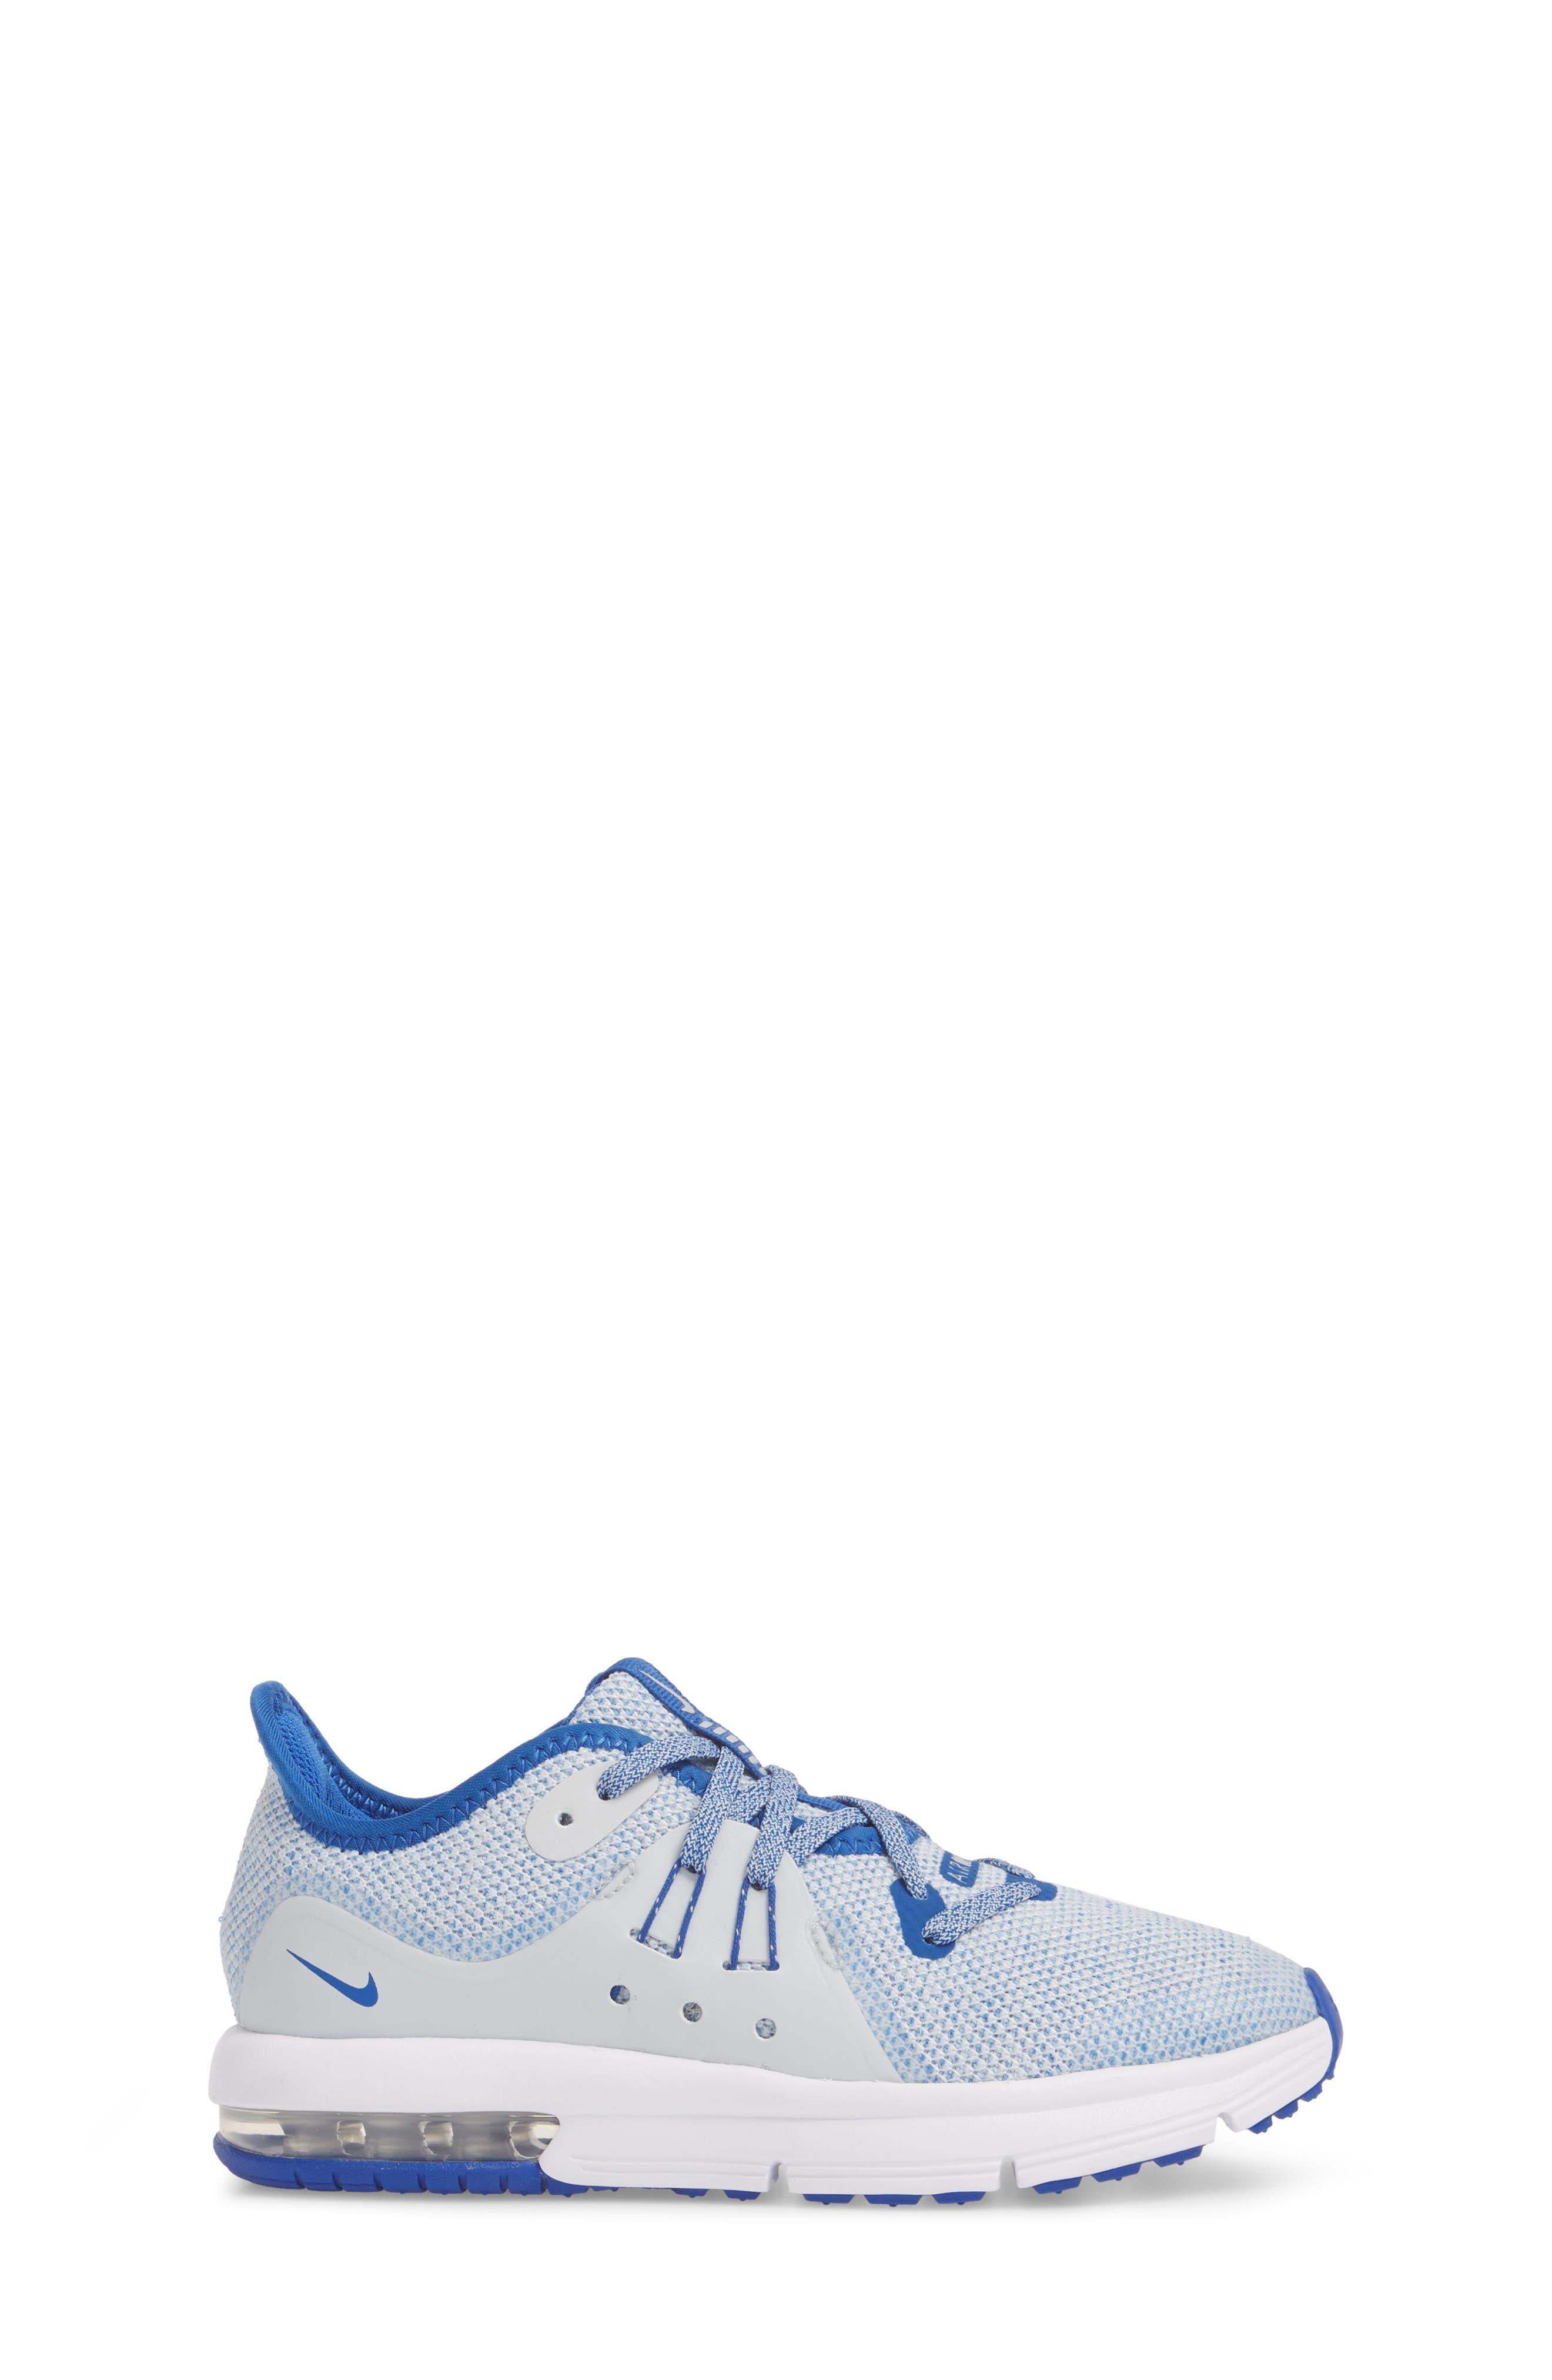 Alternate Image 3  - Nike Air Max Sequent 3 GS Running Shoe (Toddler, Little Kid & Big Kid)